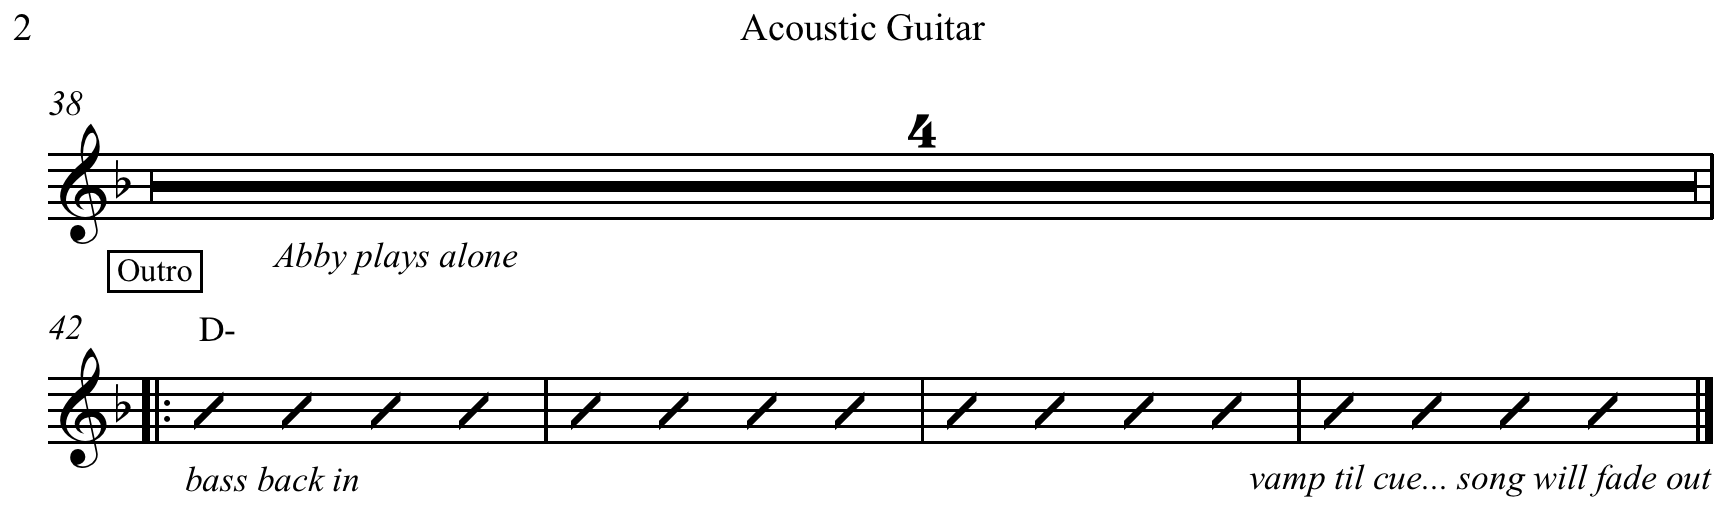 A Basic Guitar Chord Chart Example 2